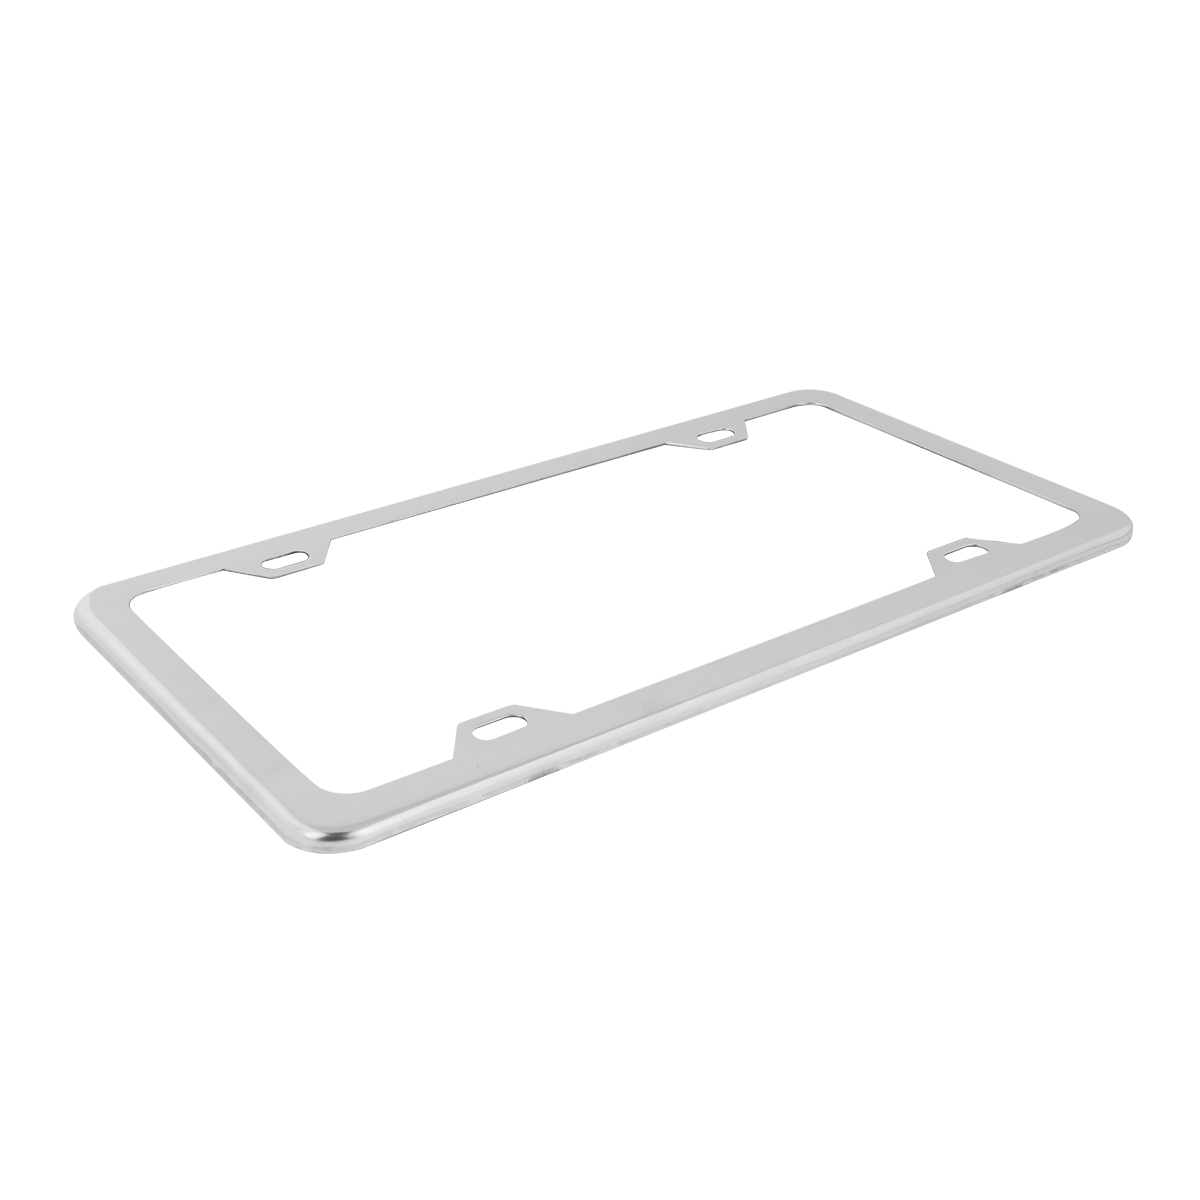 KA Depot Four Hole Slim Version Matte Flat Black License Plate Frame T304 Stainless Steel Metal Screw Caps